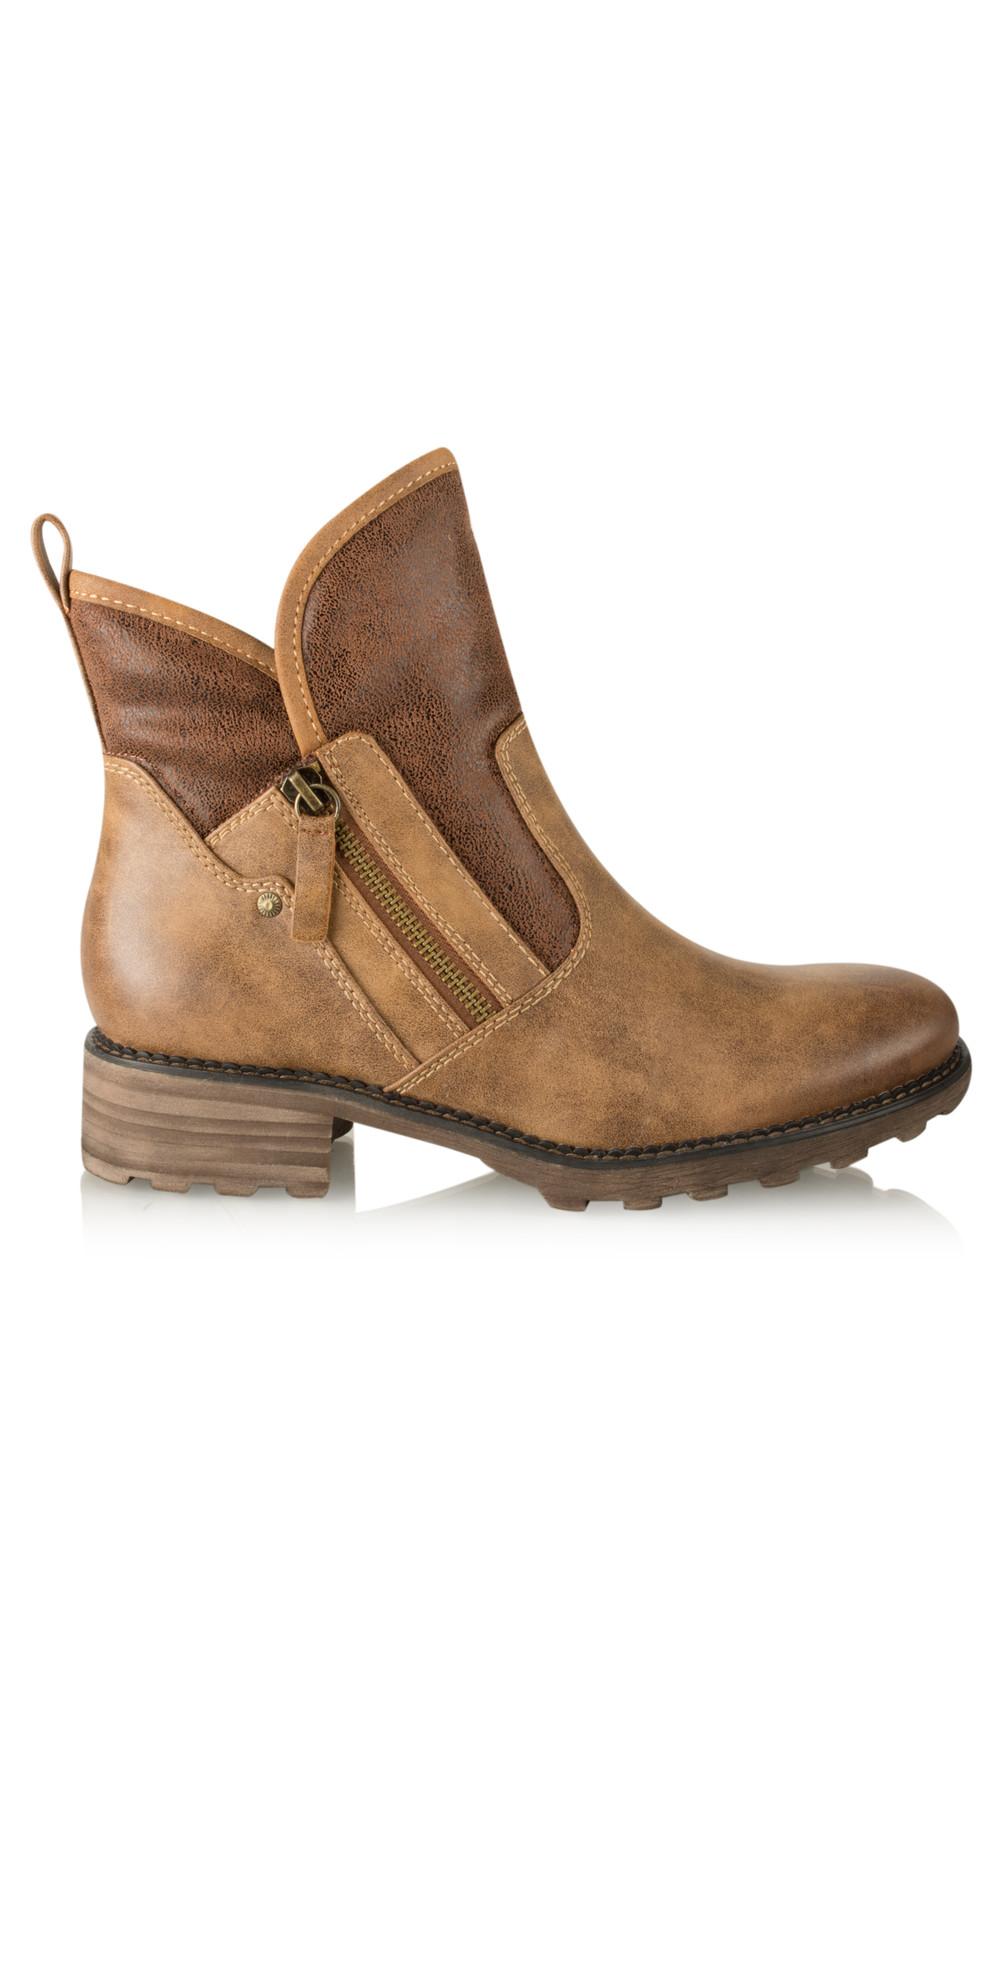 Urban Chunky Imit Boot main image